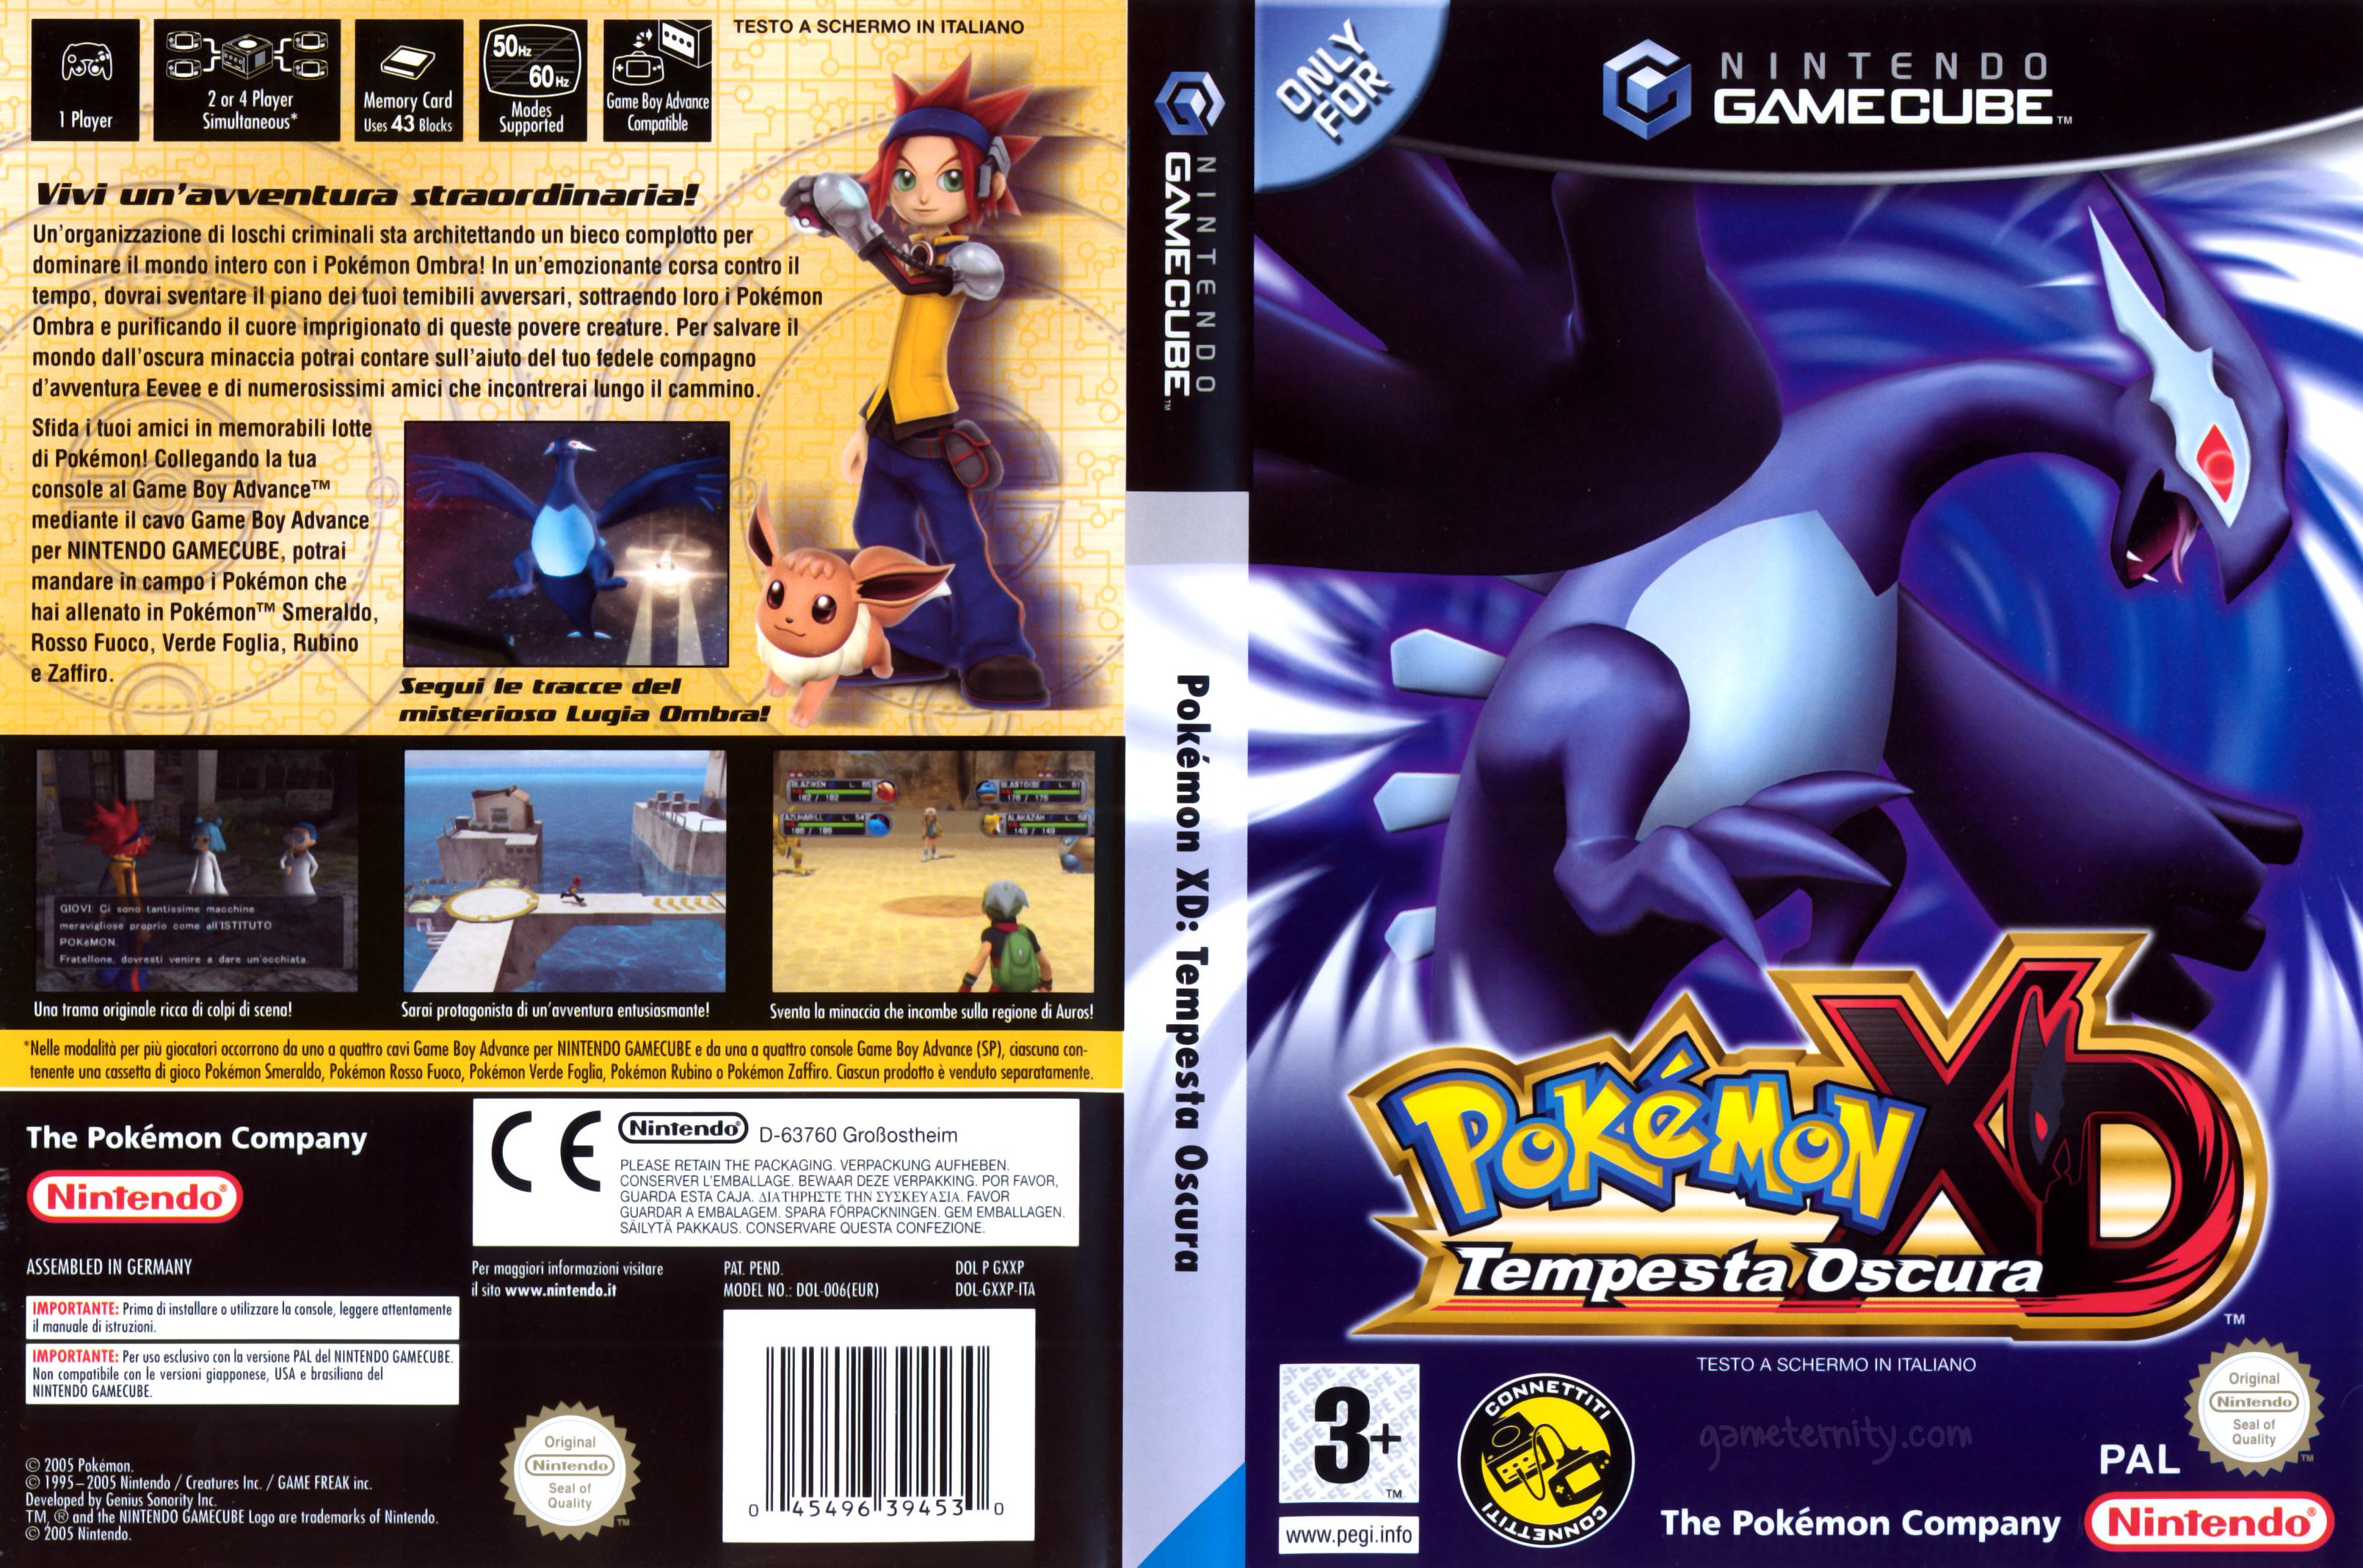 Pokemon XD Tempestad Oscura  (Espanol) (Juegos 2014)